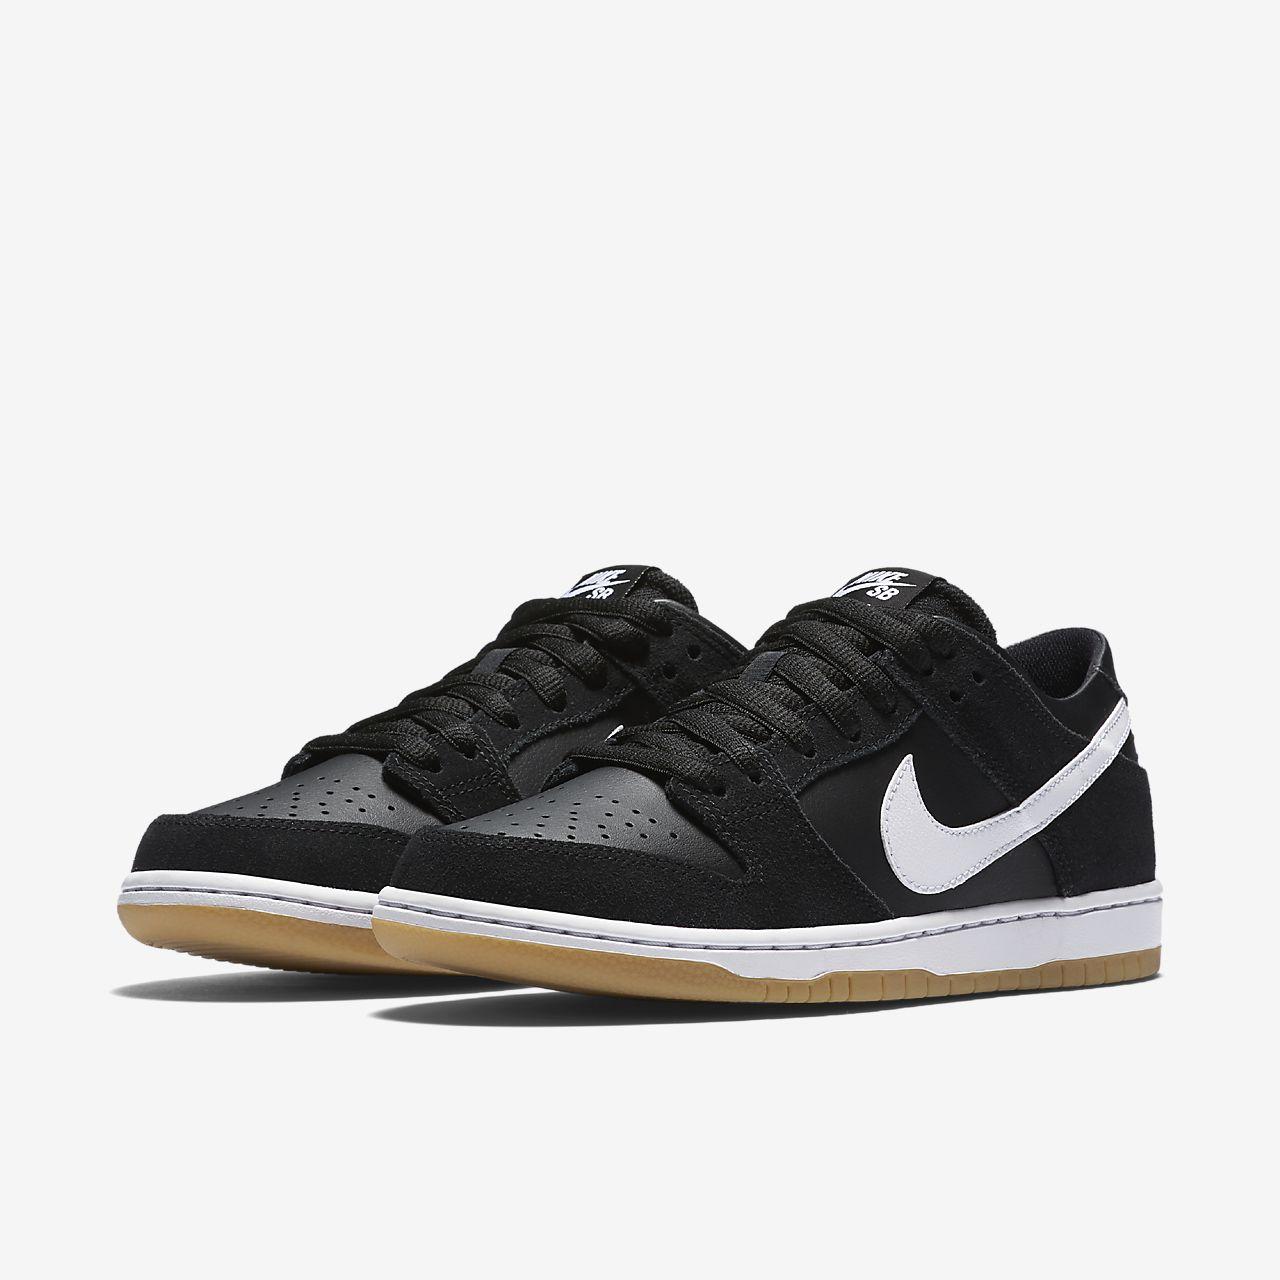 Mens Nike Skate Shoes Australia Style Guru Fashion